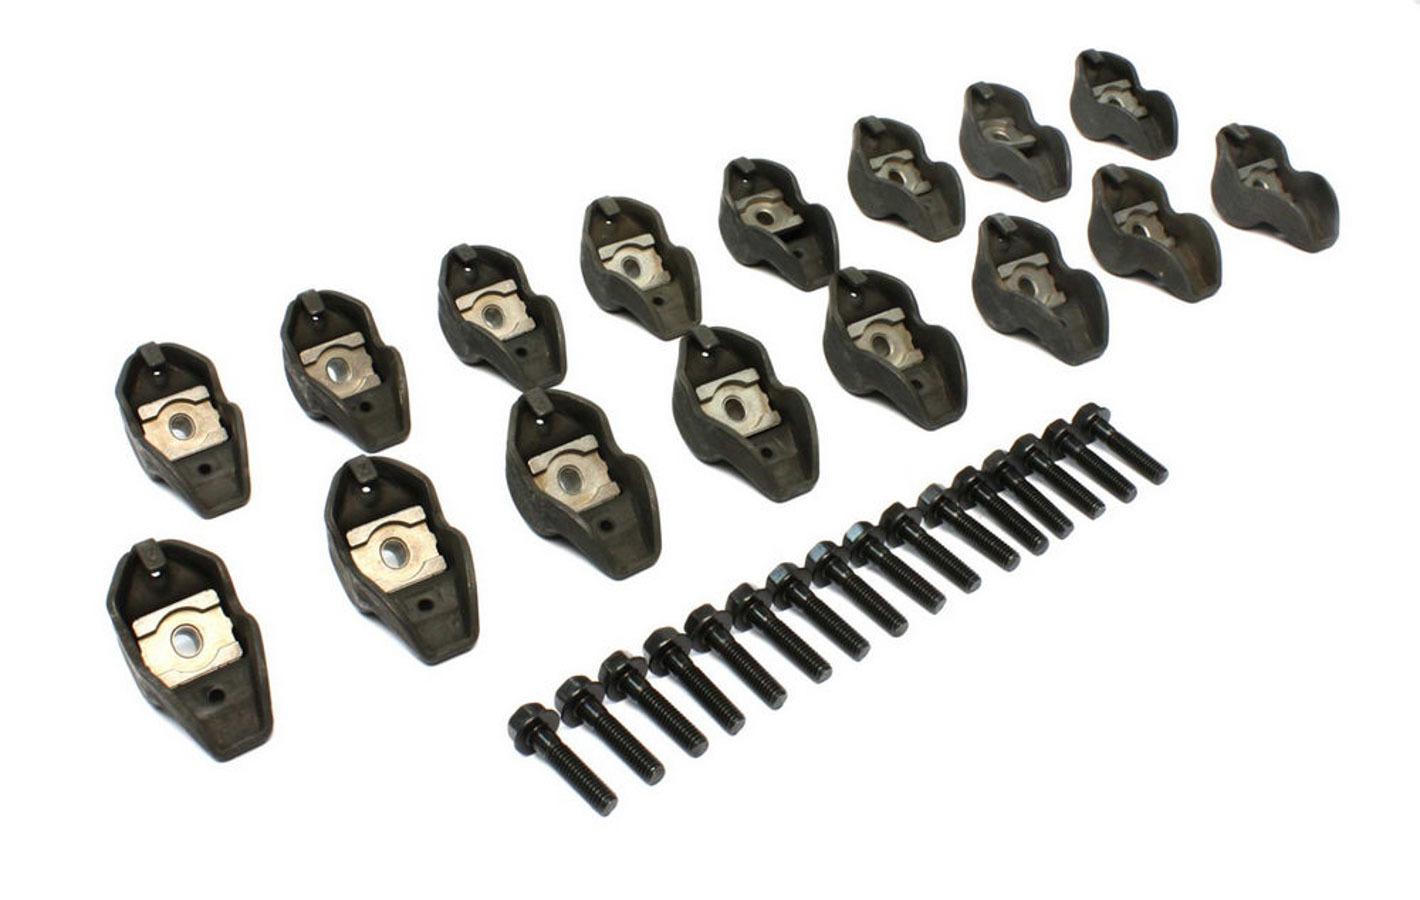 Comp Cams 1232-16 Rocker Arm, High Energy, Pedestal Mount, 1.73 Ratio, OEM / Long Slot, Steel, Big Block Ford / Cleveland / Modified, Set of 16